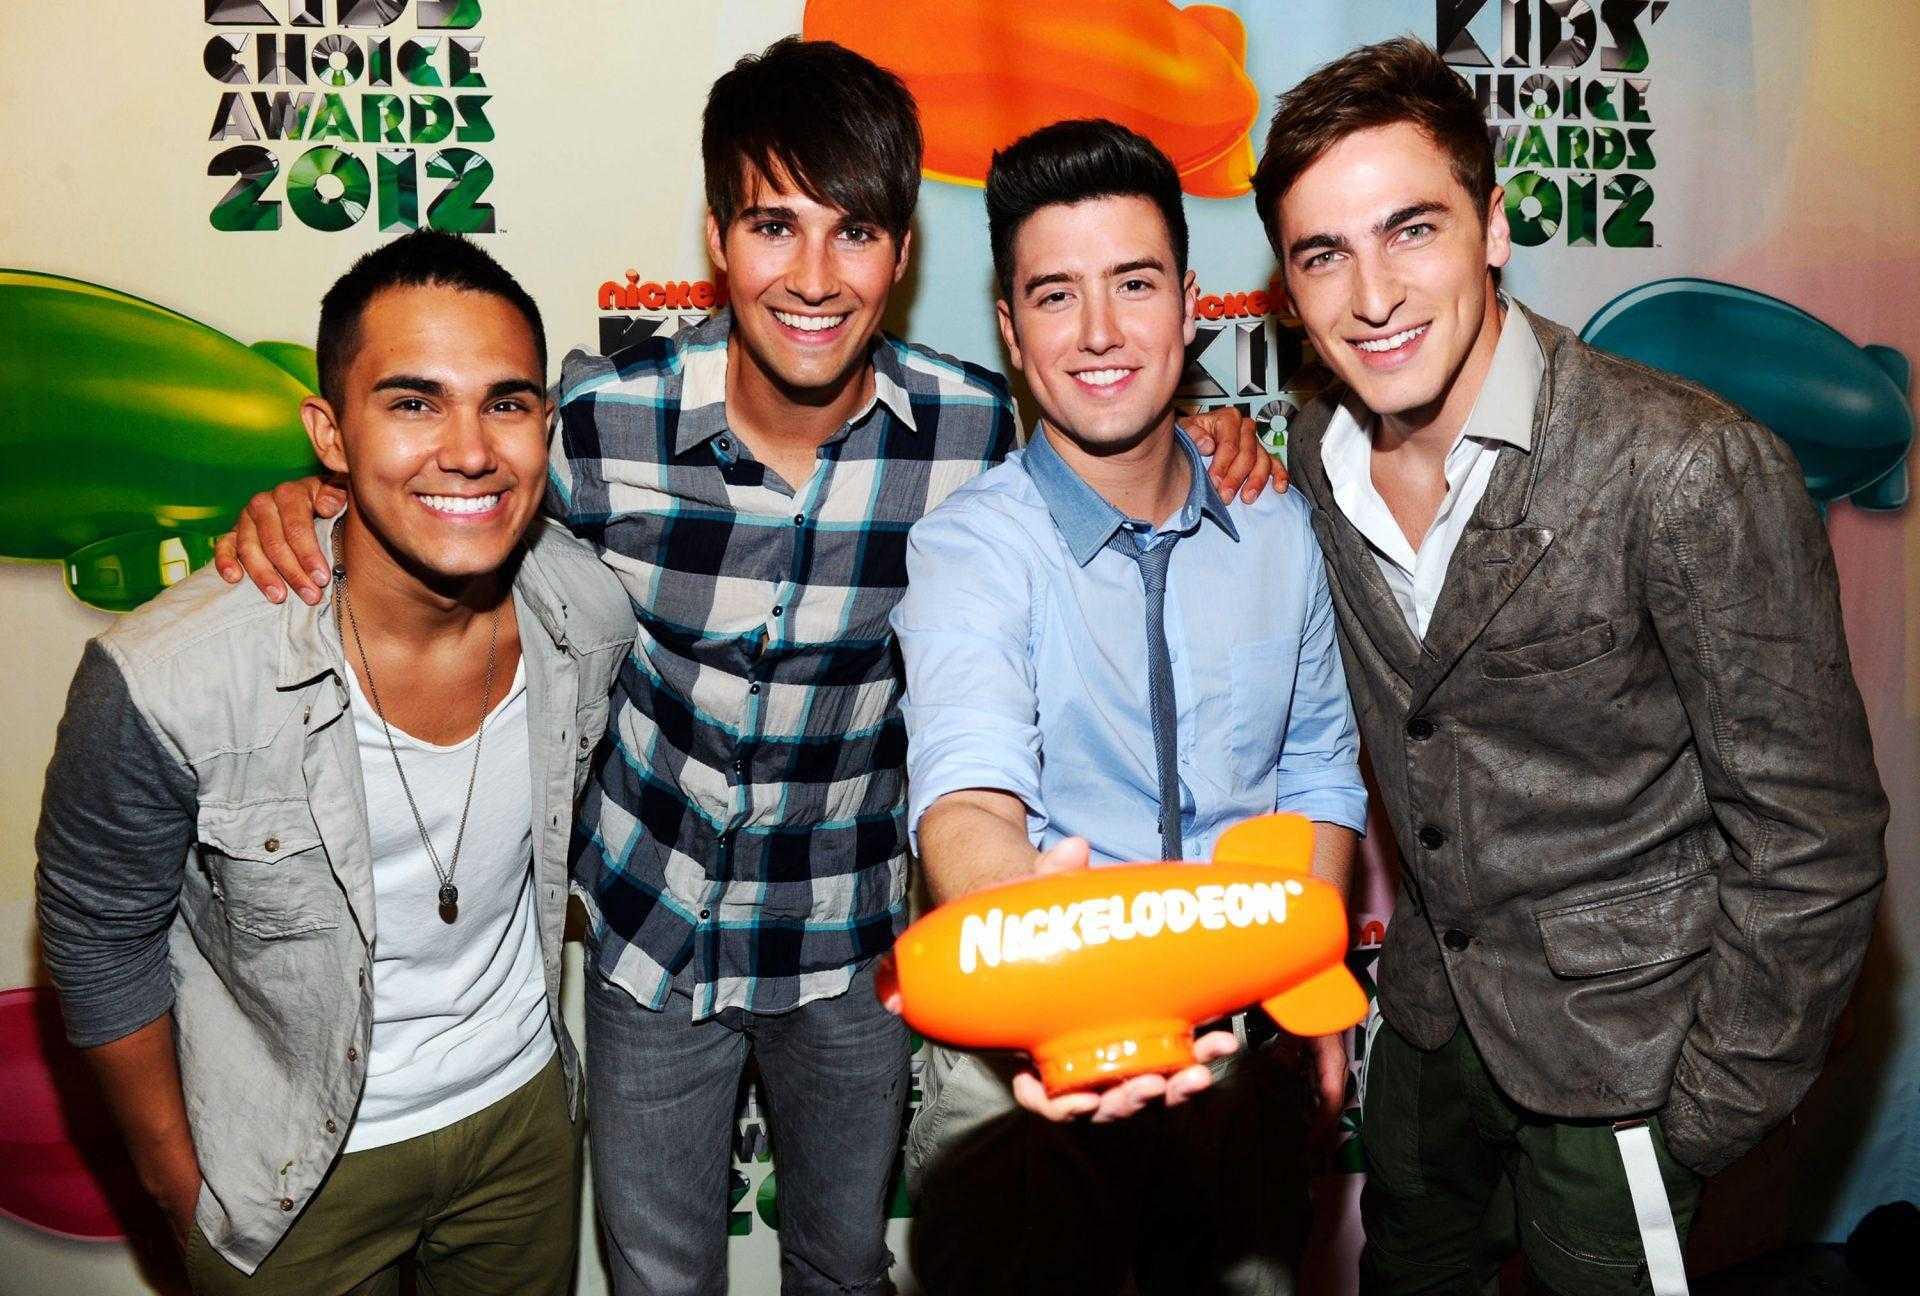 Kids' Choice Awards 2012: Martedì 3 Aprile su Nickelodeon   Digitale terrestre: Dtti.it